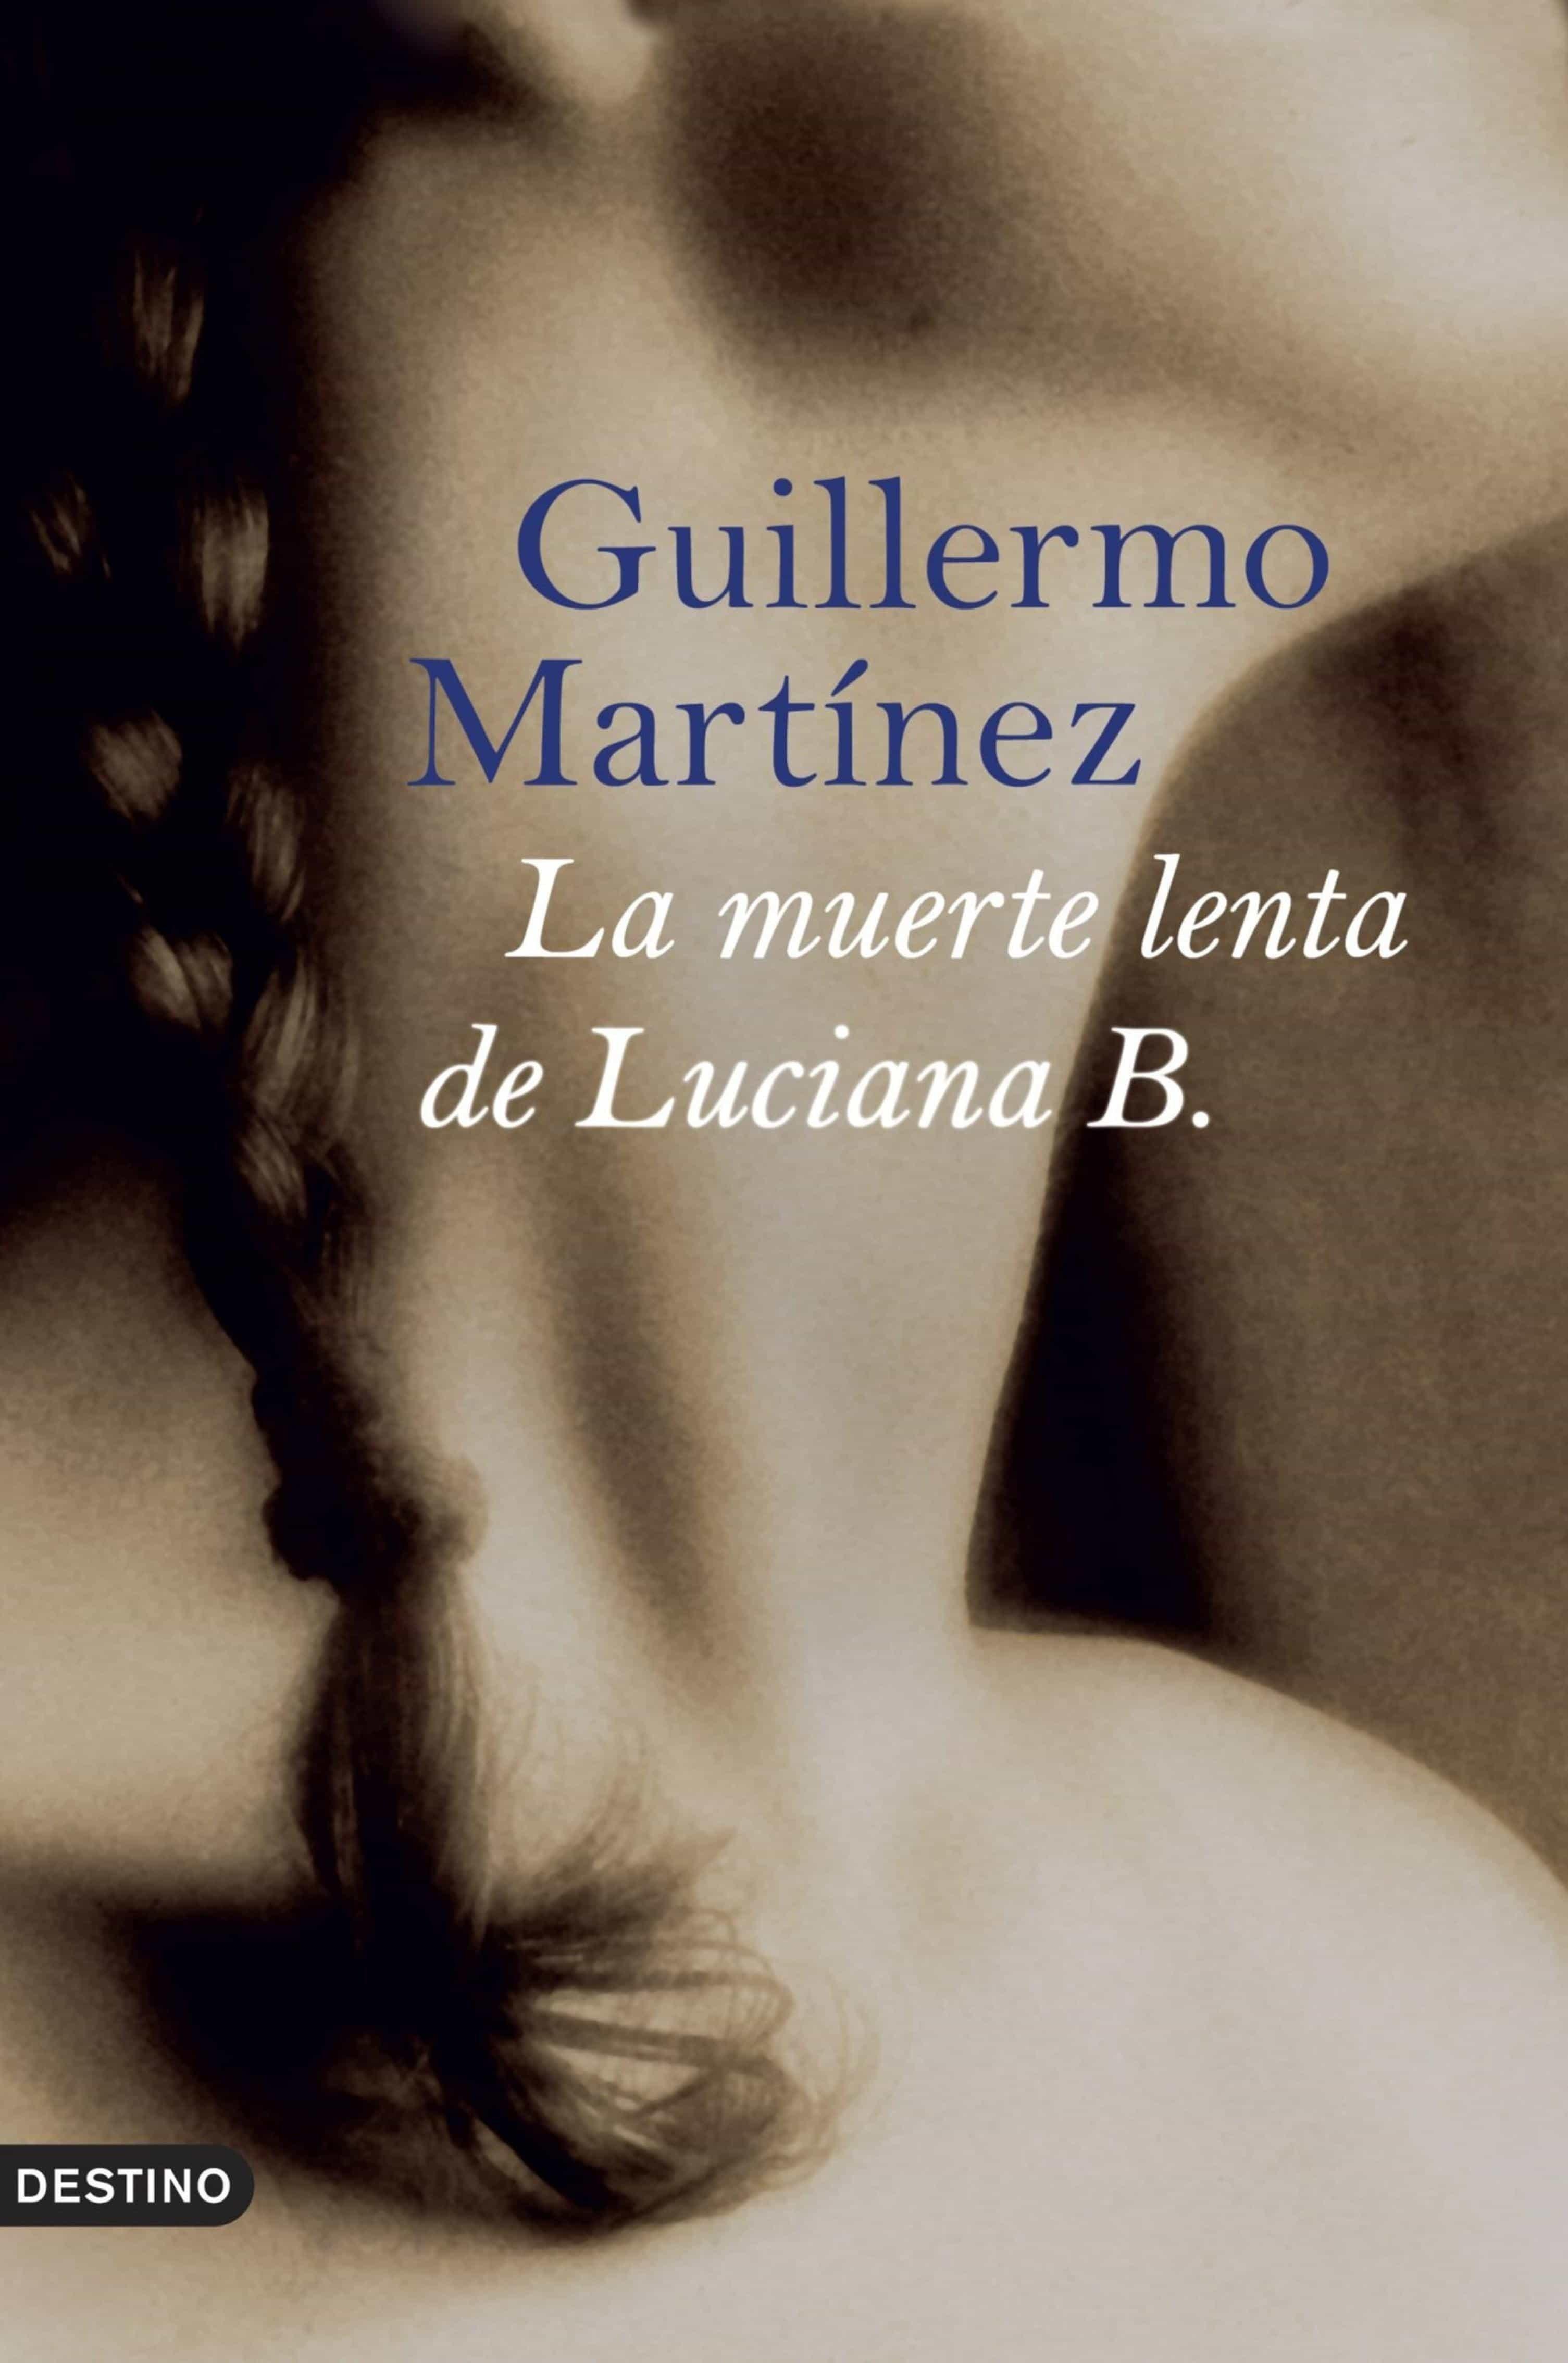 (ebook)guillermo Martinez9788423319466